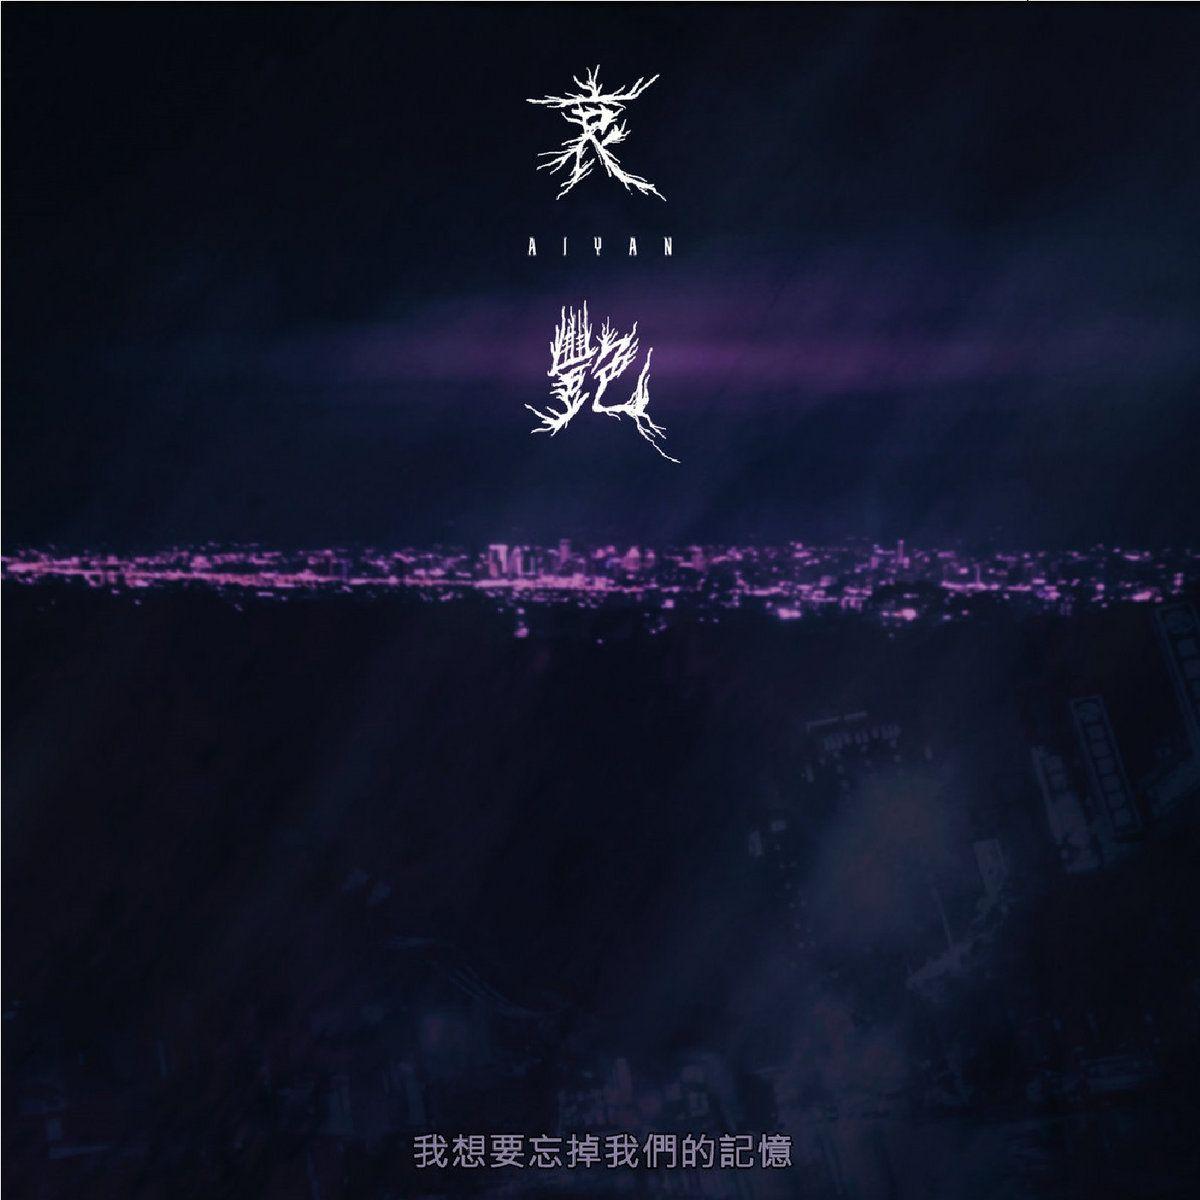 Reviews for Ai Yan / 哀豔 - 我想要忘掉我們的記憶